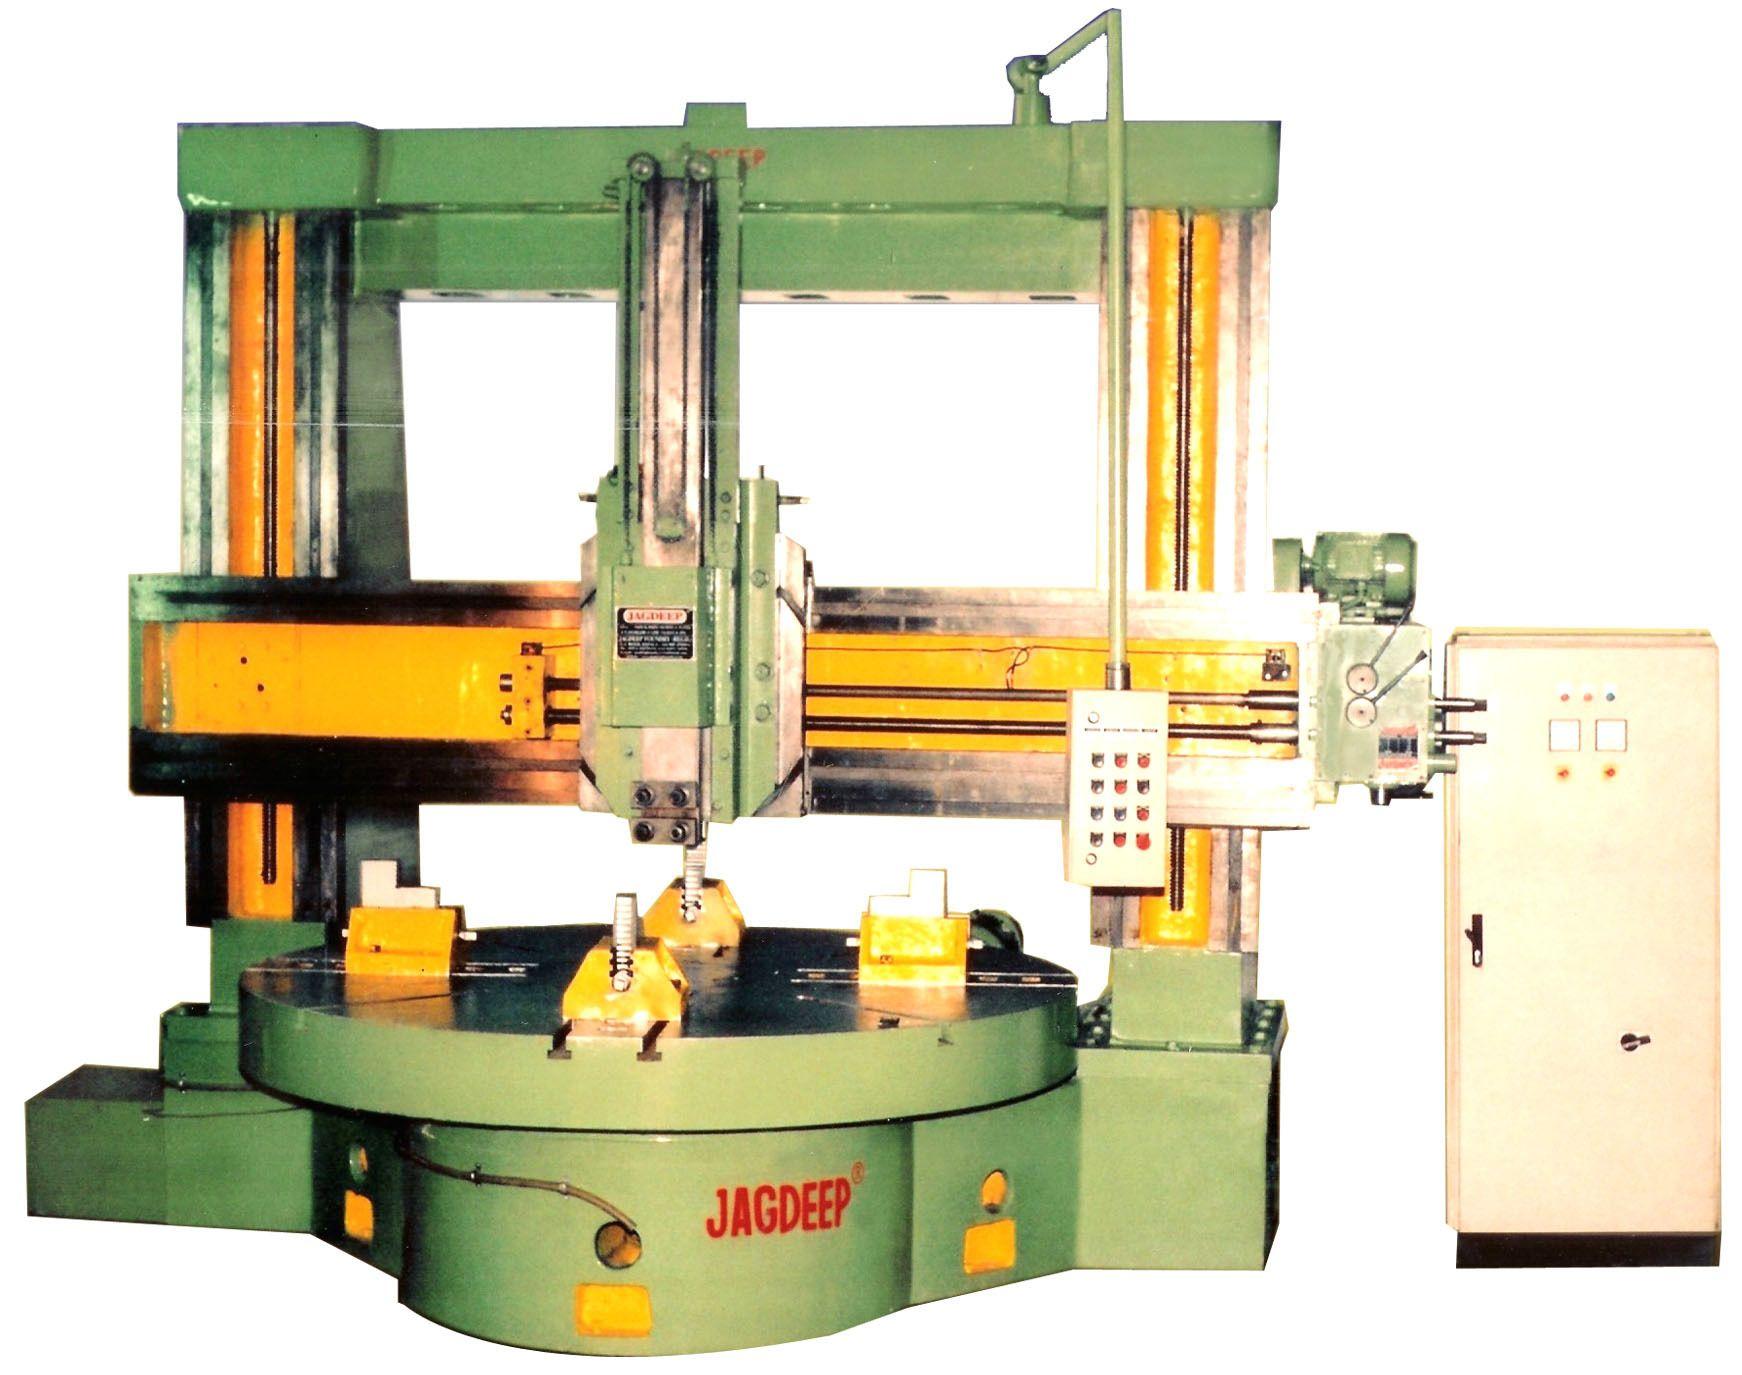 Semi-automatic Jagdeep Vertical Turning Lathe Machine, Jvt 2